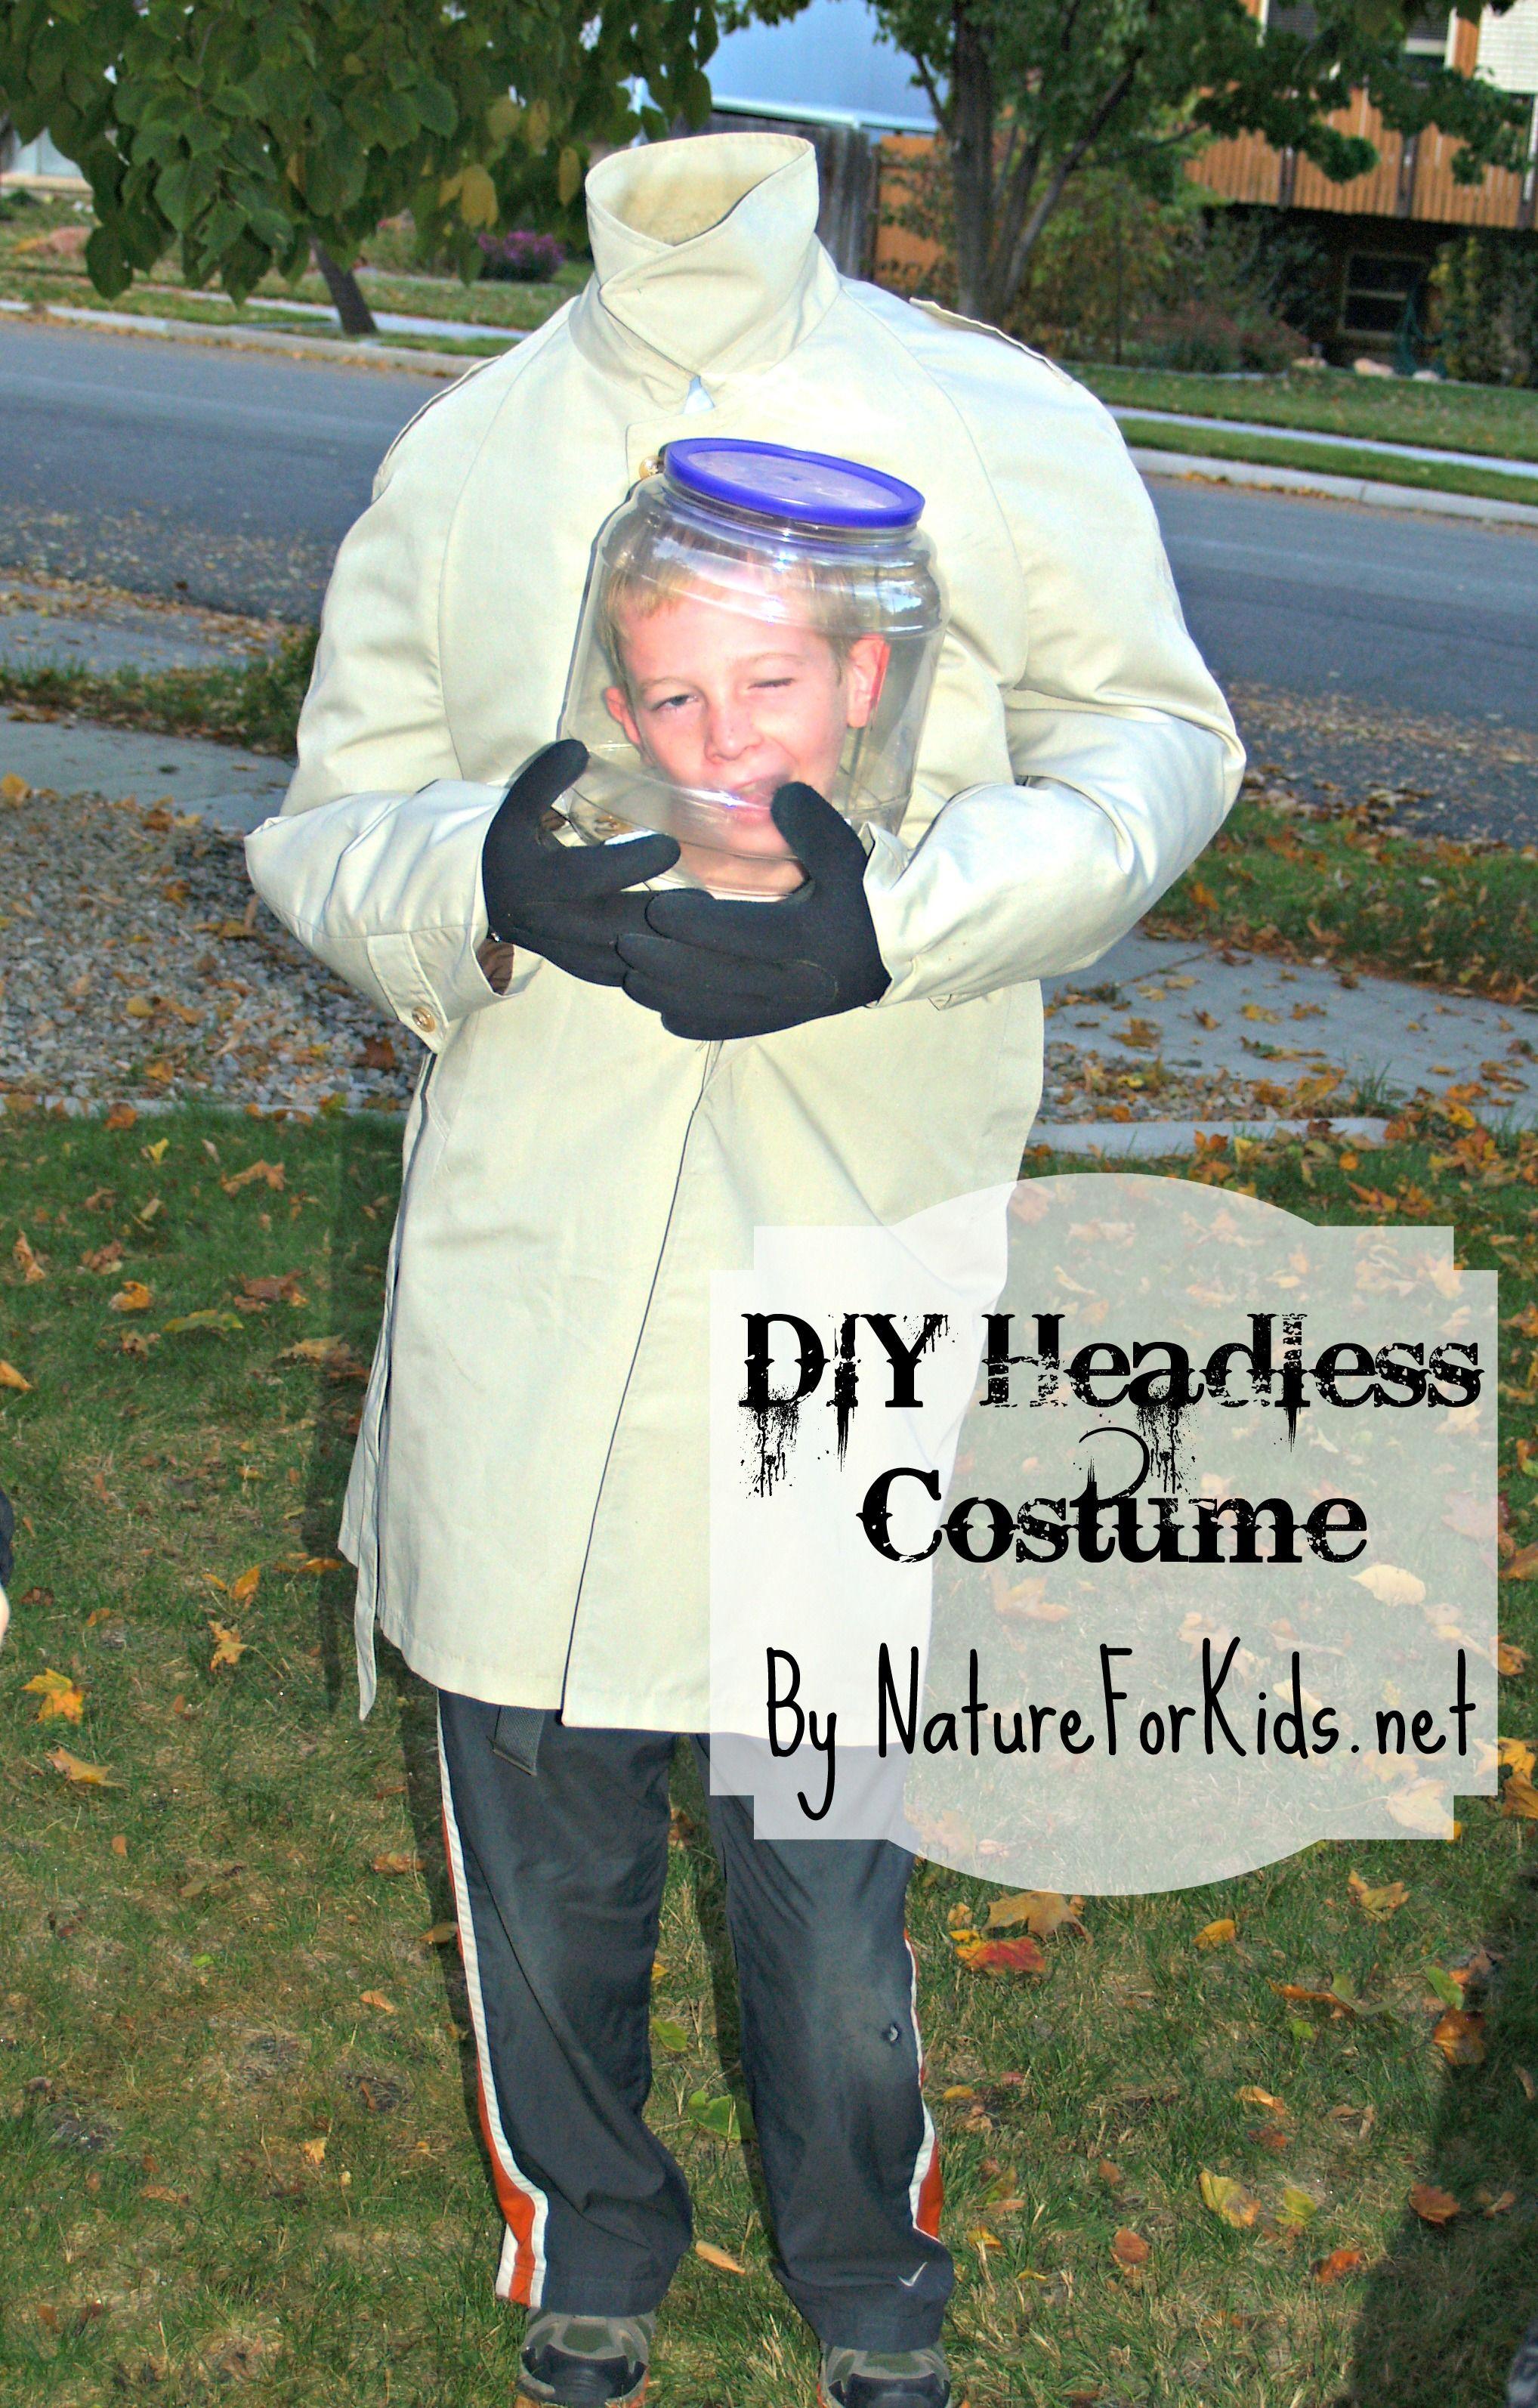 kids mummy costume | Costumes | Pinterest | Kids mummy costume ...